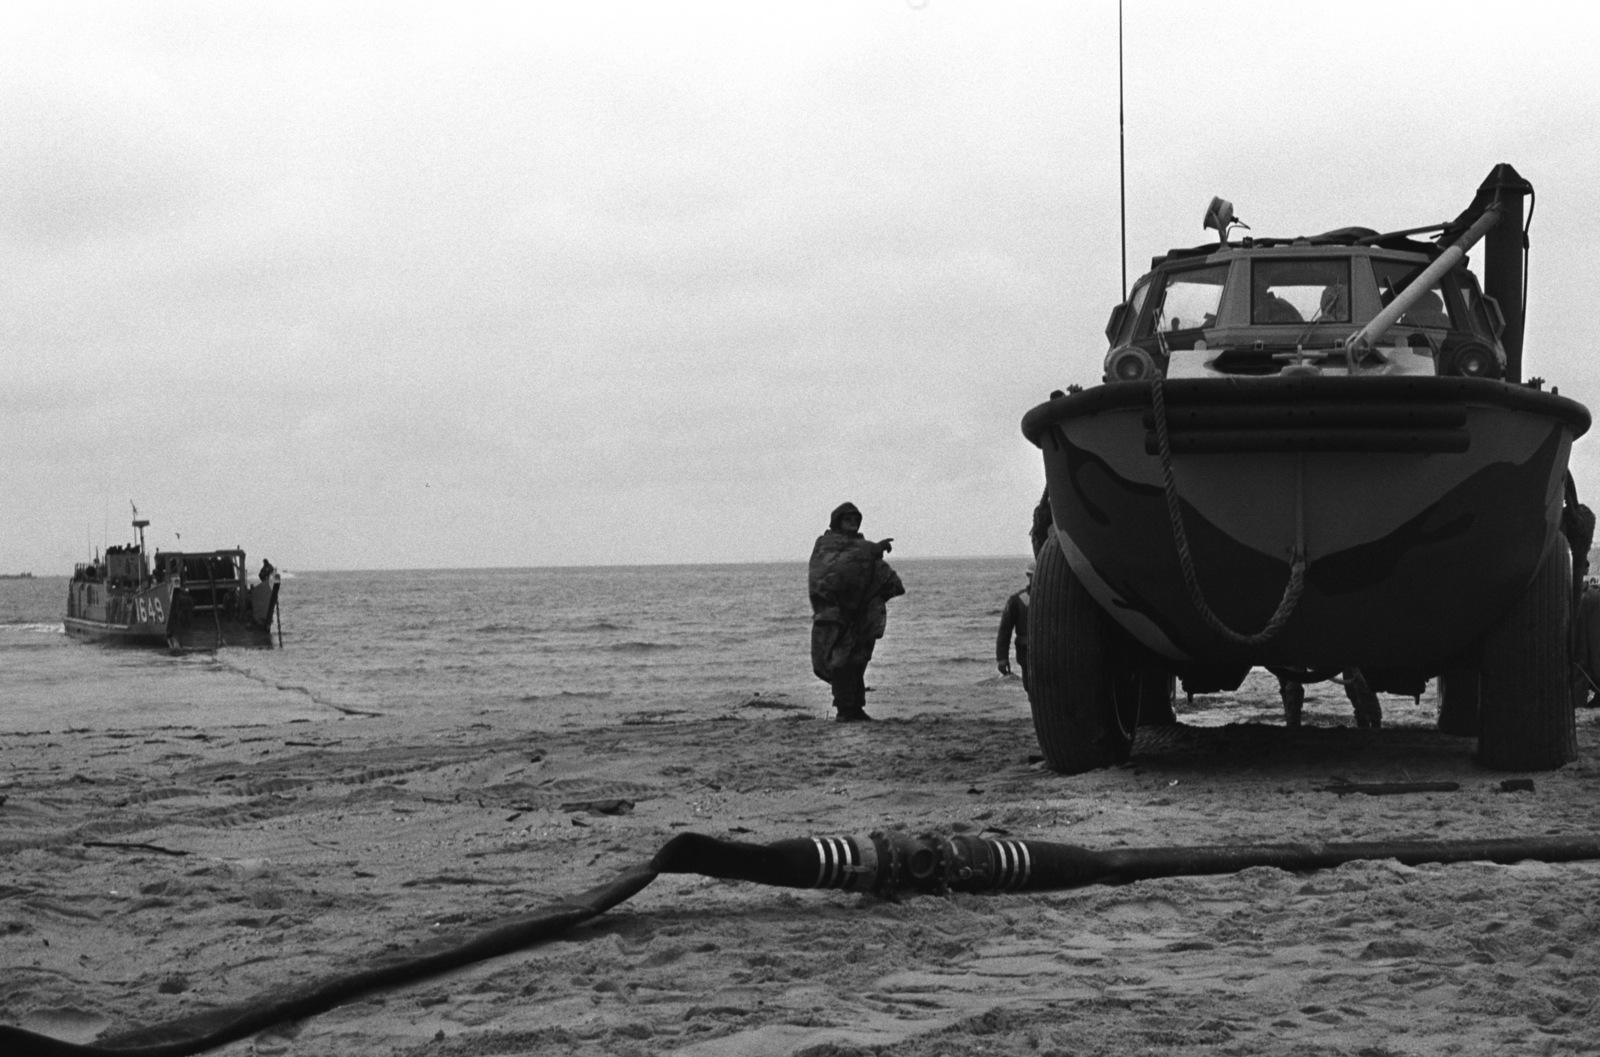 A US Marine guides a LARC 5 amphibious cargo carrier onto the beach